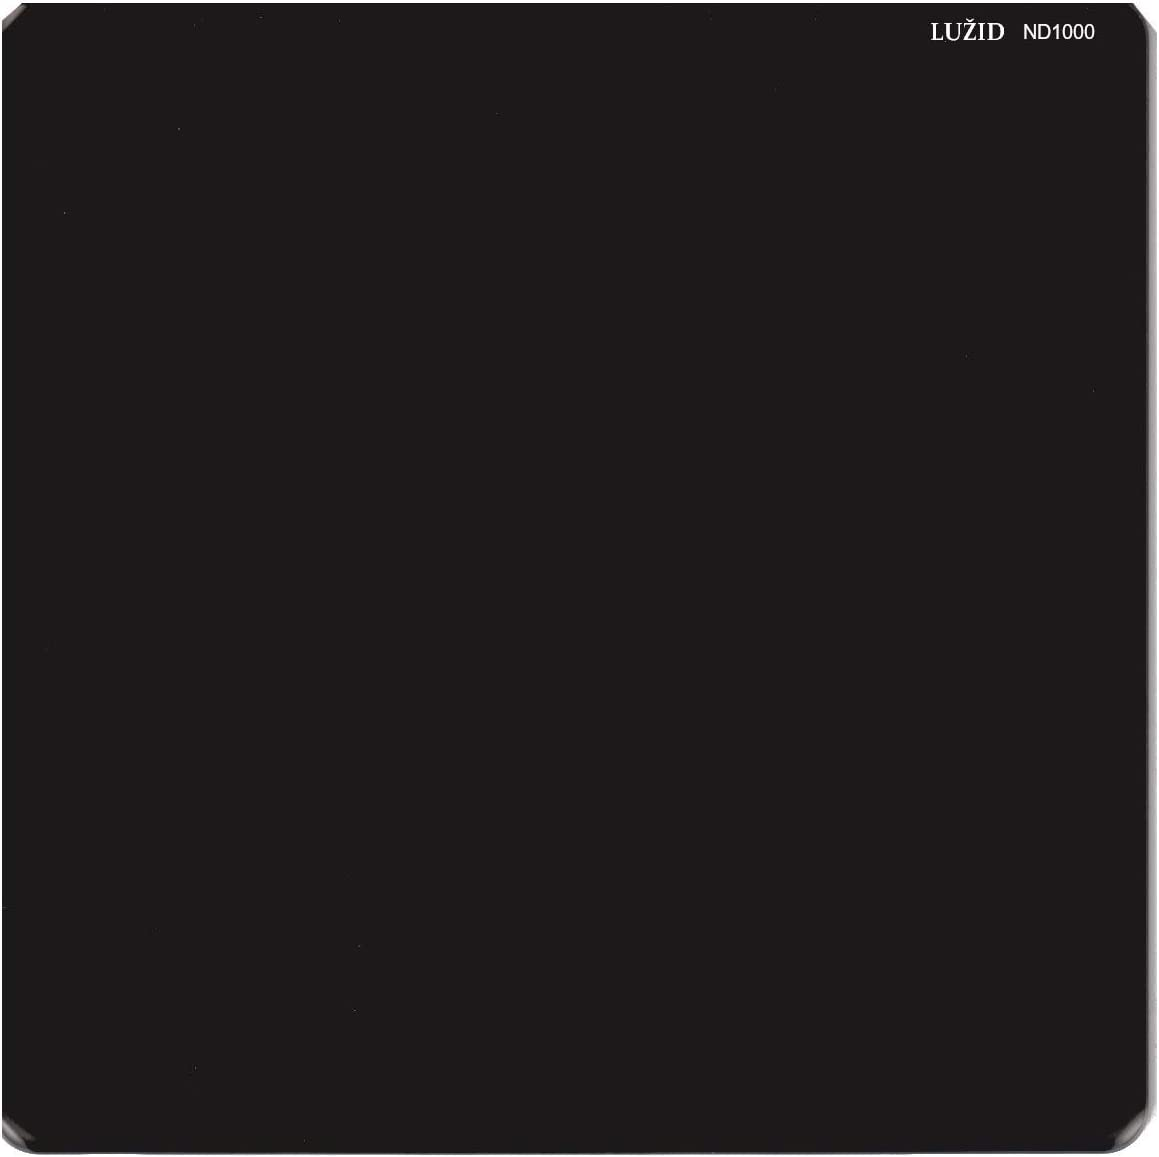 LUŽID 100mm ND1000 MC Filter Multi-Coated Luzid ND 1000 3.0 100 Neutral Density Schott B270 Optical Glass